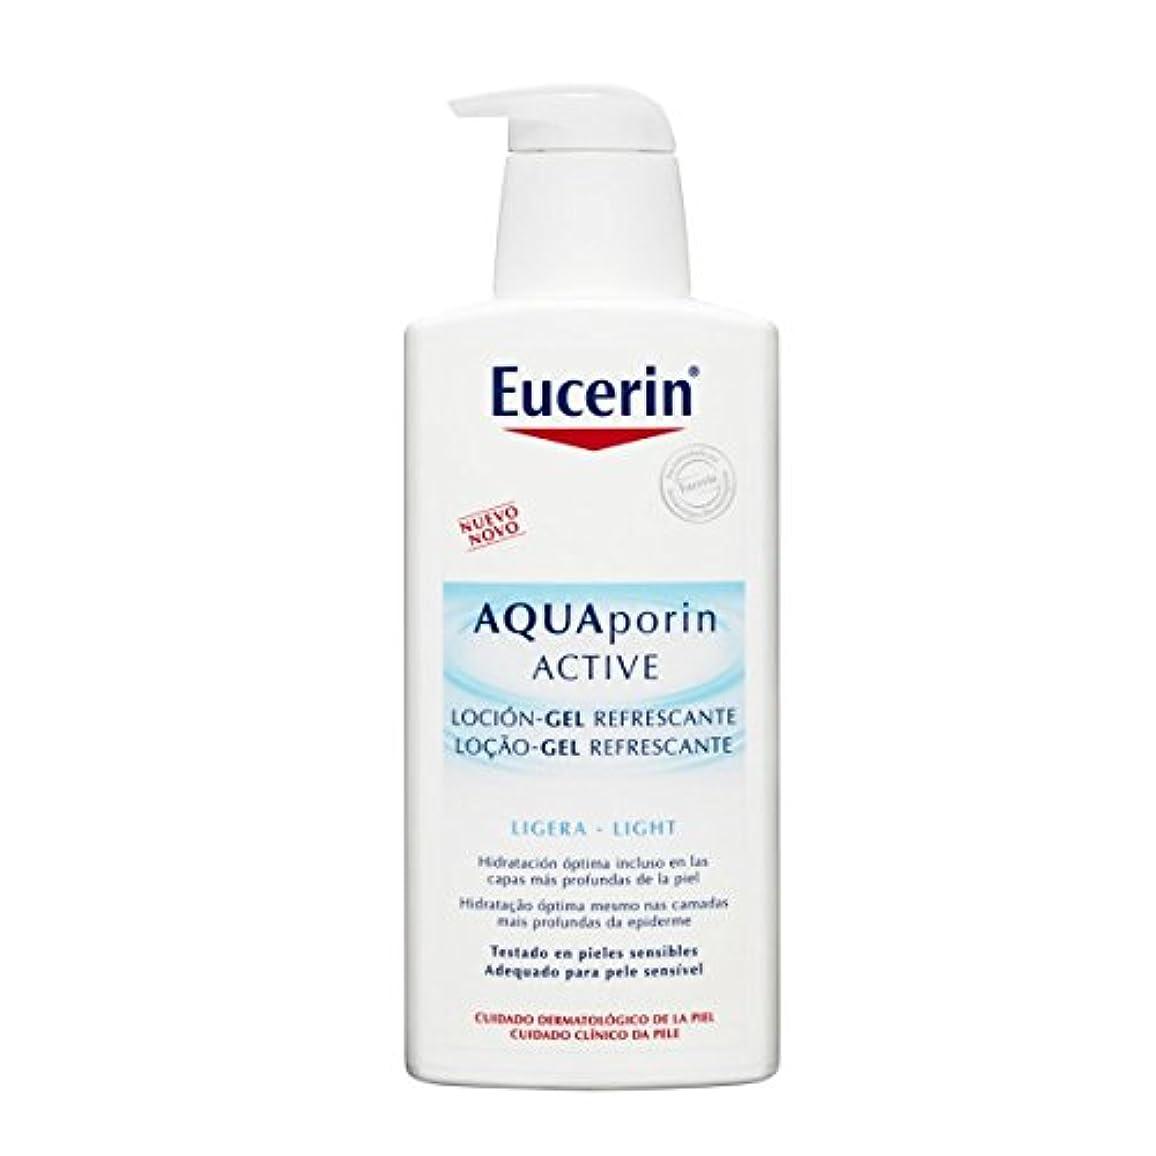 薬財布栄光Eucerin Aquaporin Active Intense Body Balm 400ml [並行輸入品]